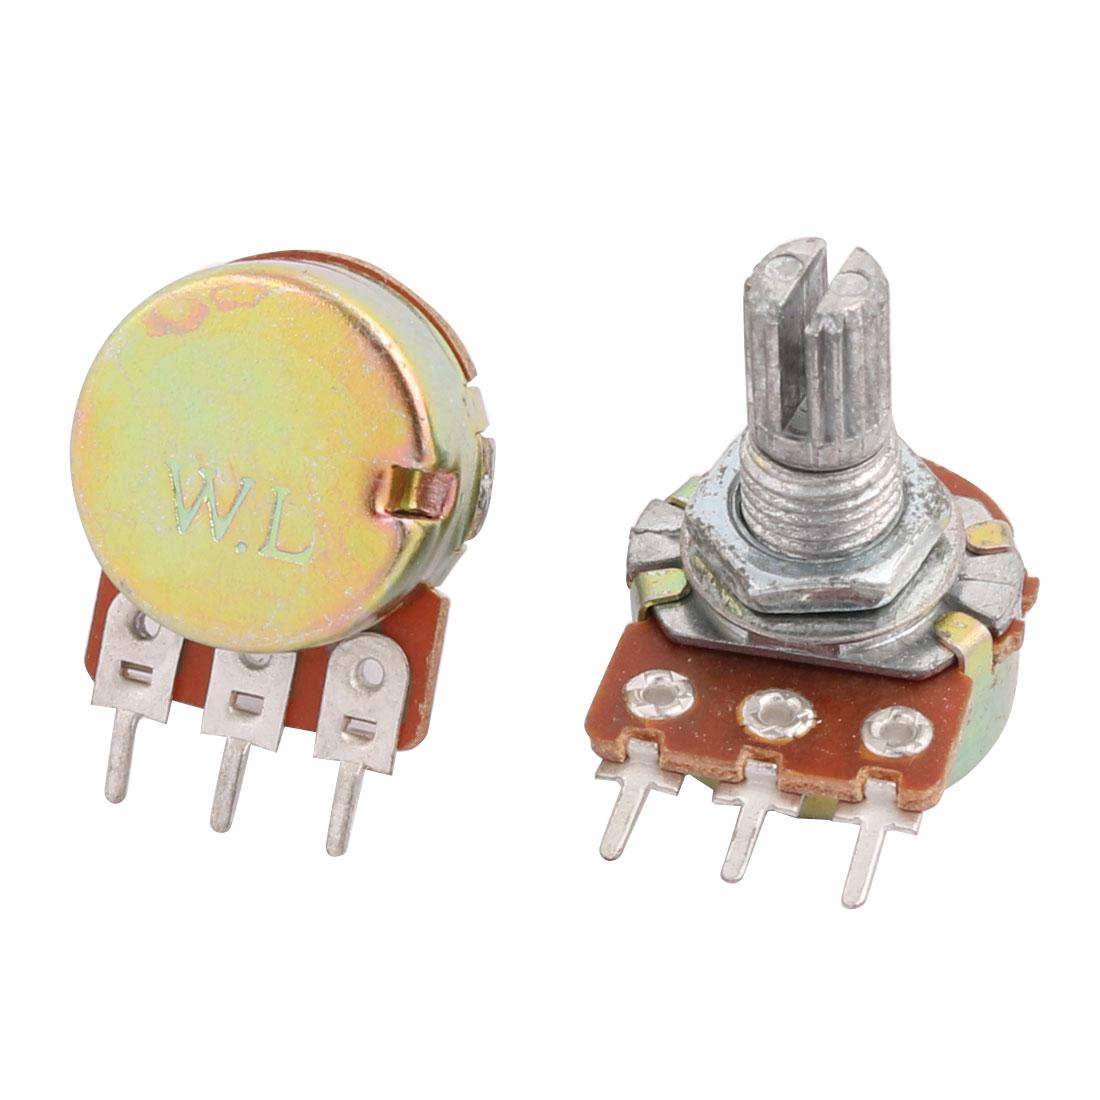 2 Pcs B50K 50K Ohm 3 Terminals Single Linear Rotary Taper Potentiometers